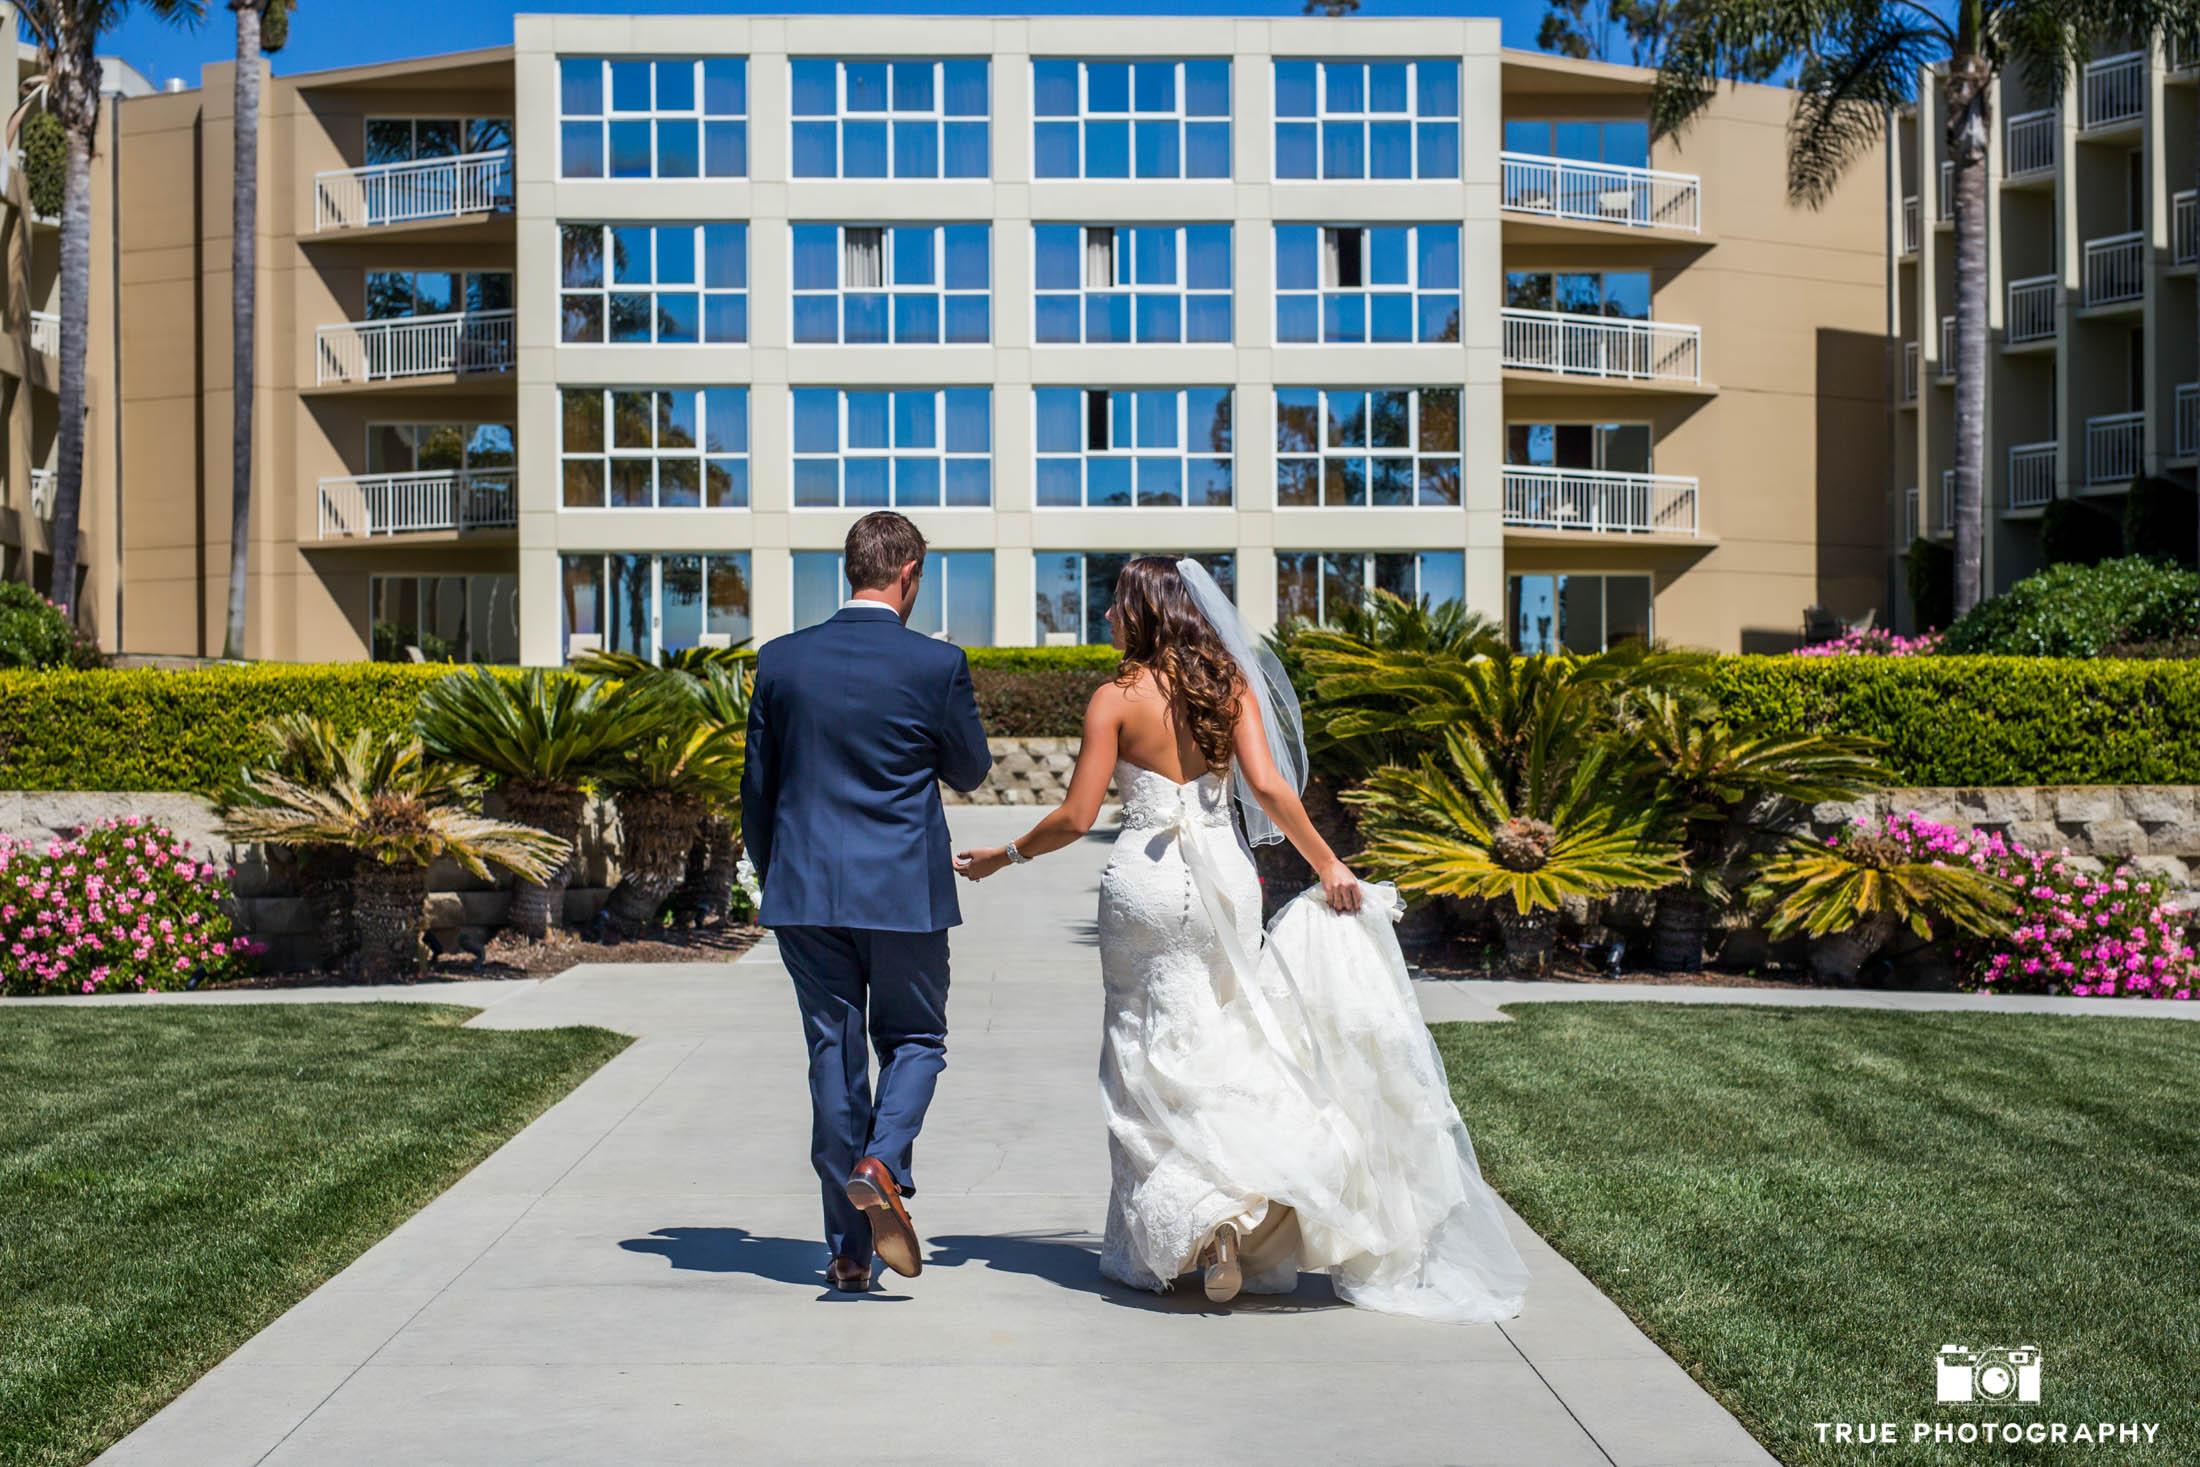 Hilton Torrey Pines California